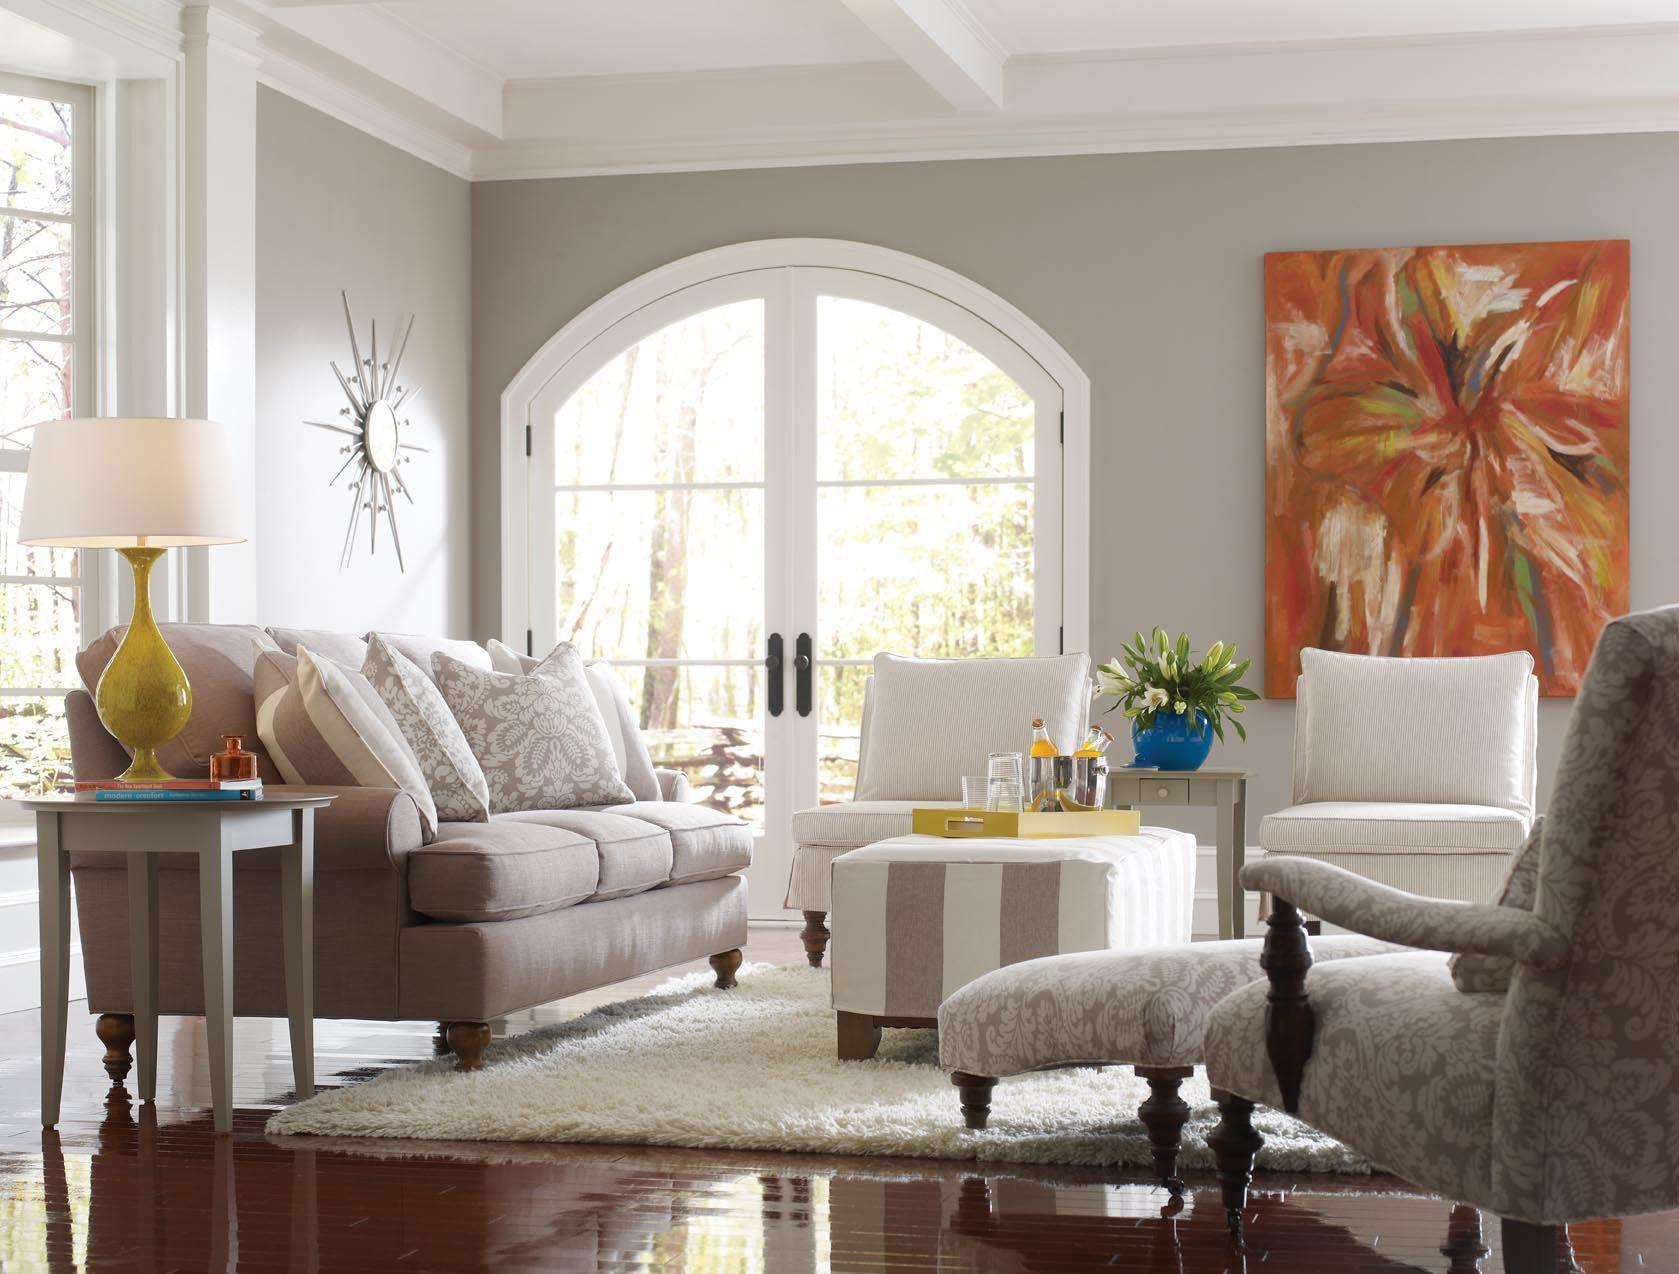 Superb Furniture Stores In Knoxville   Bradenu0027s Lifestyles Furniture   Rowe  Furniture   Interior Design   The